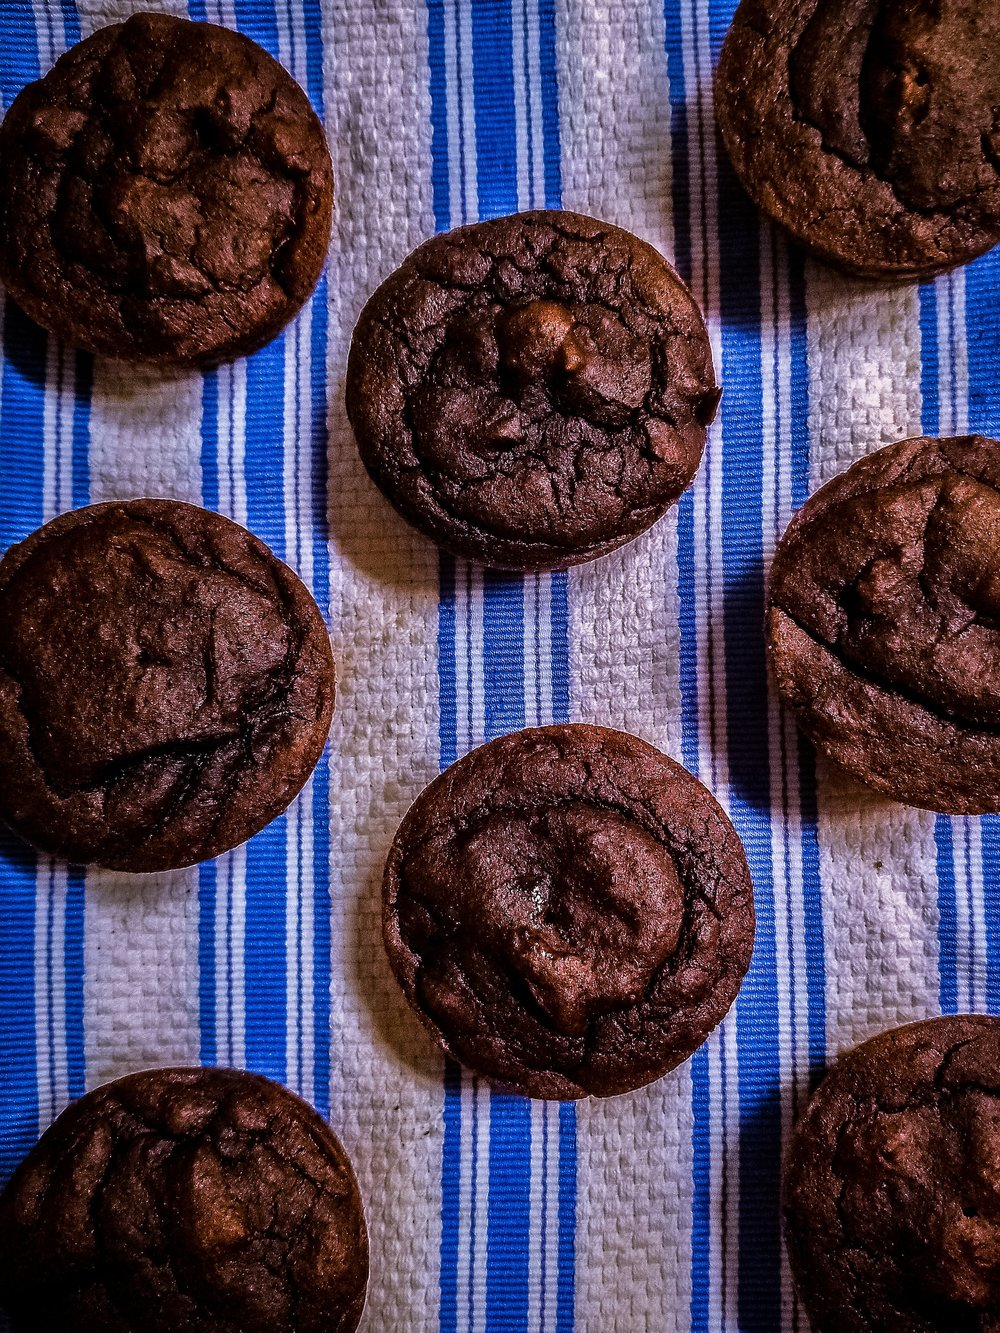 Gluten-free black bean brownies sweetened with dates